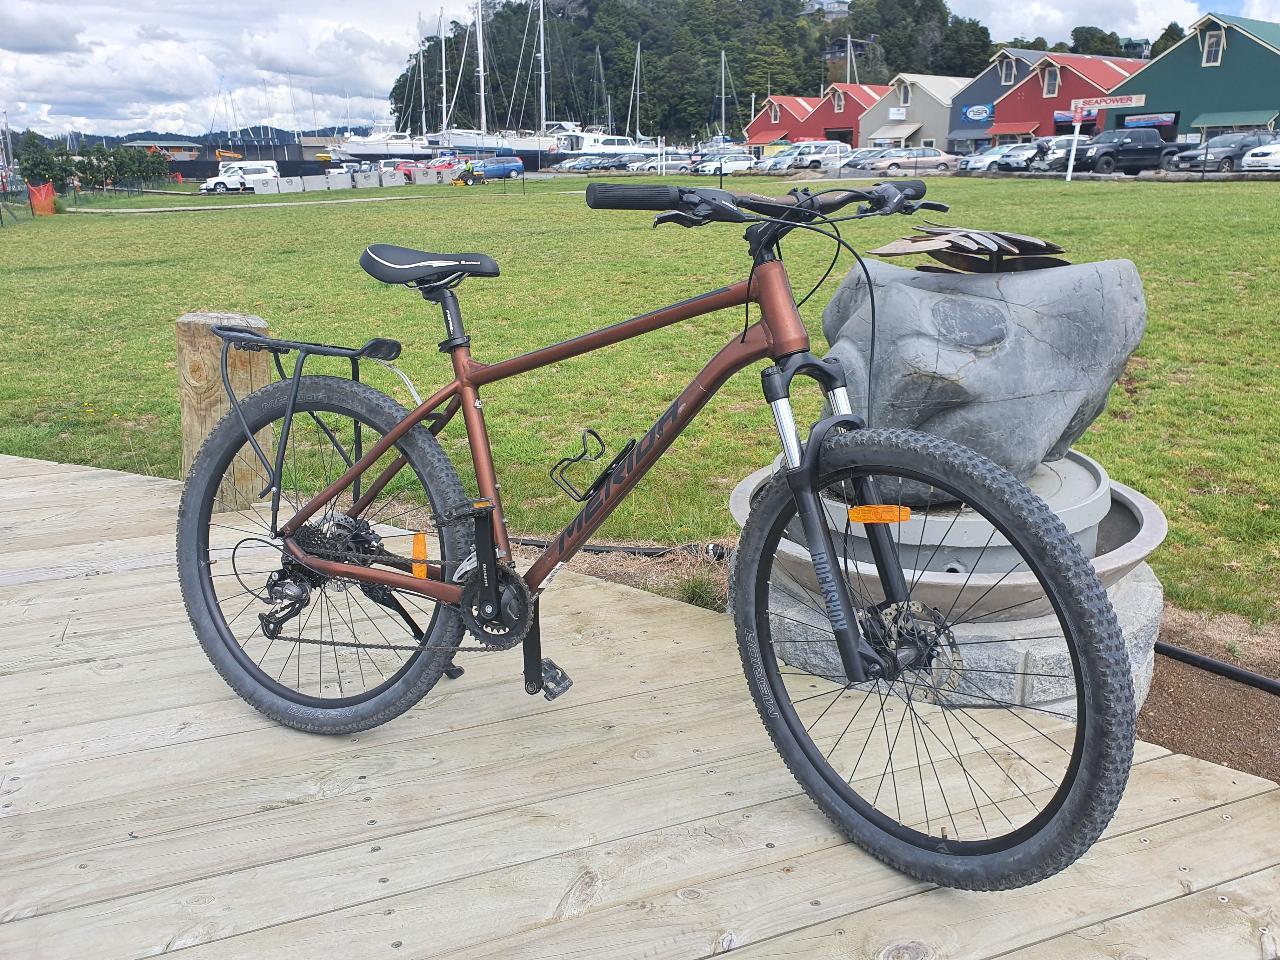 Half Day Mountain Bike Hire